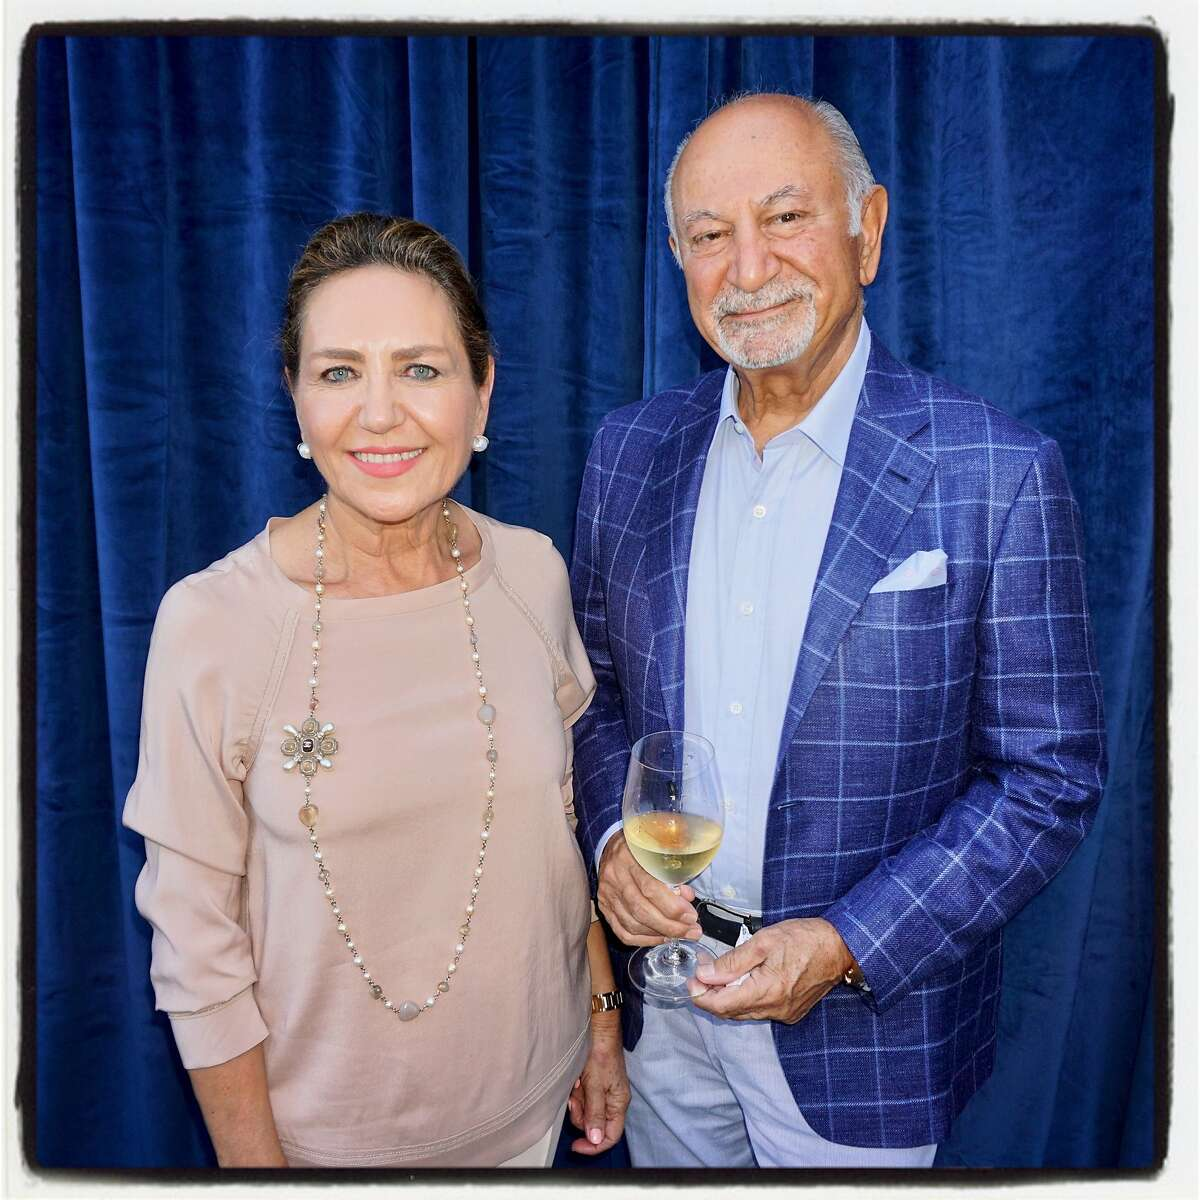 Festival Napa Valley honorees Shahpar and Darioush Khaledi at Blue Note in Napa. July 18, 2017.